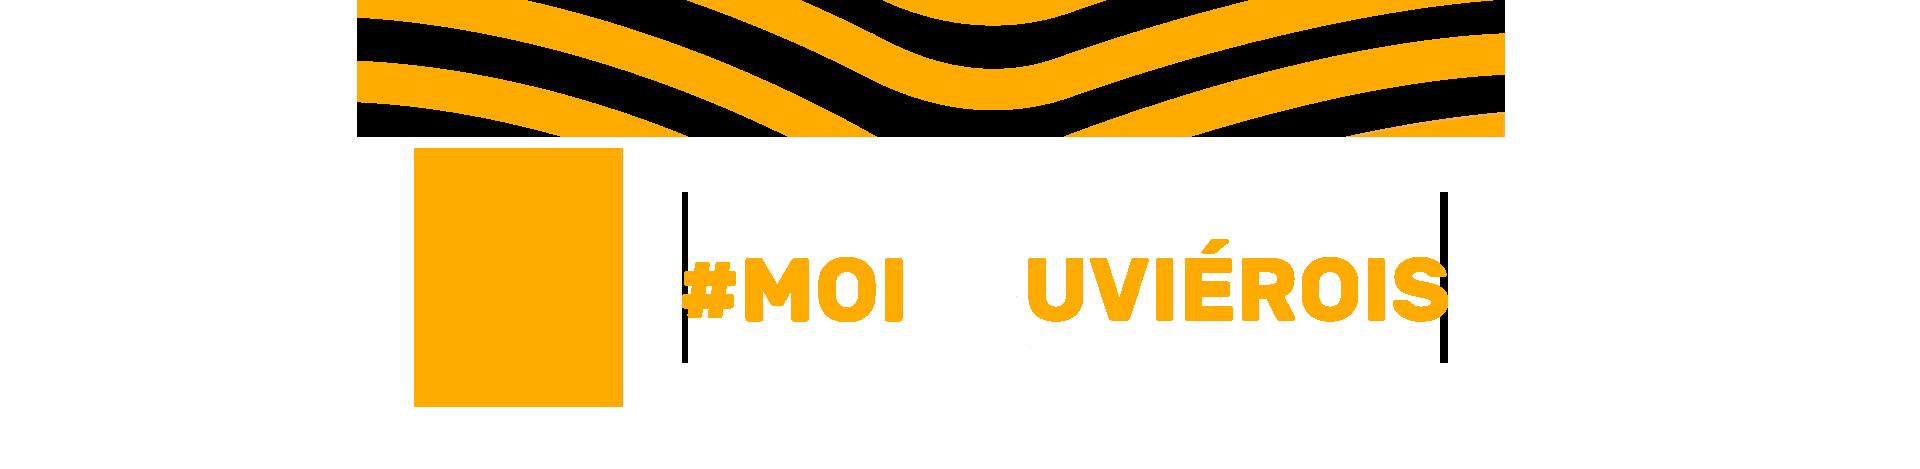 #MoiLouvierois